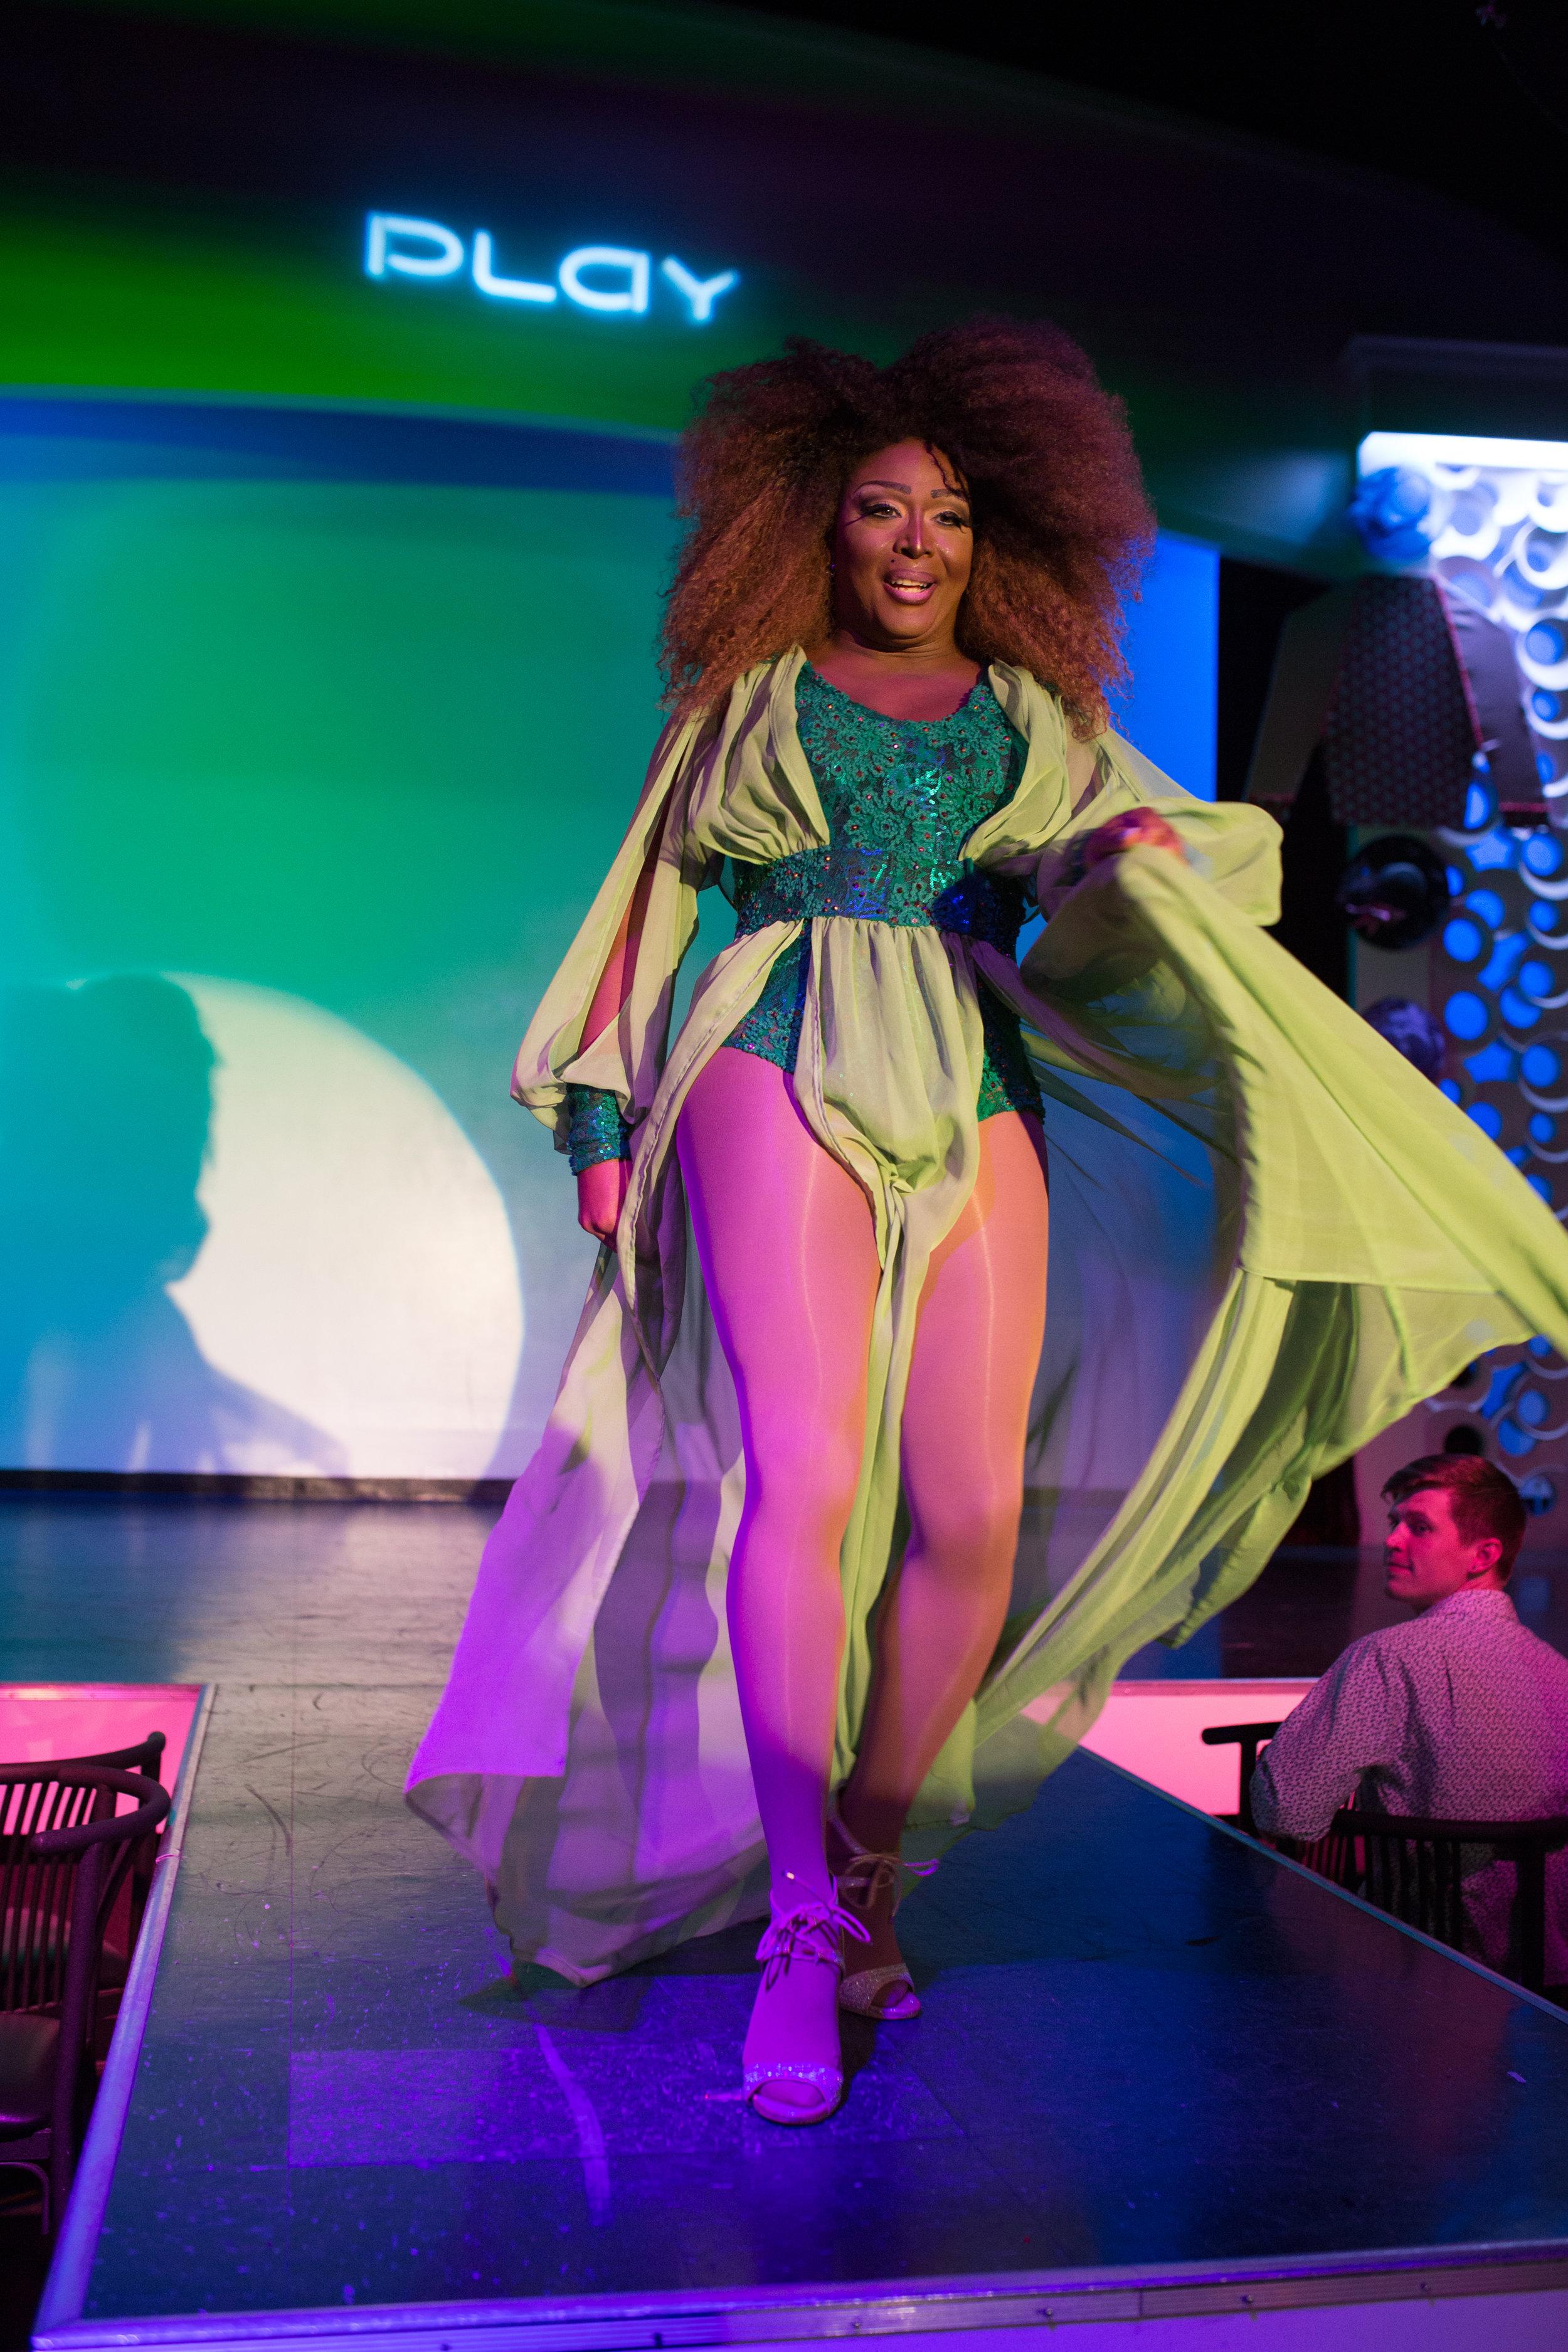 Rainbows & Roses Thurby 2017 WEBSITE FEVA PLAY Crystal Ludwick Photo 61.jpg